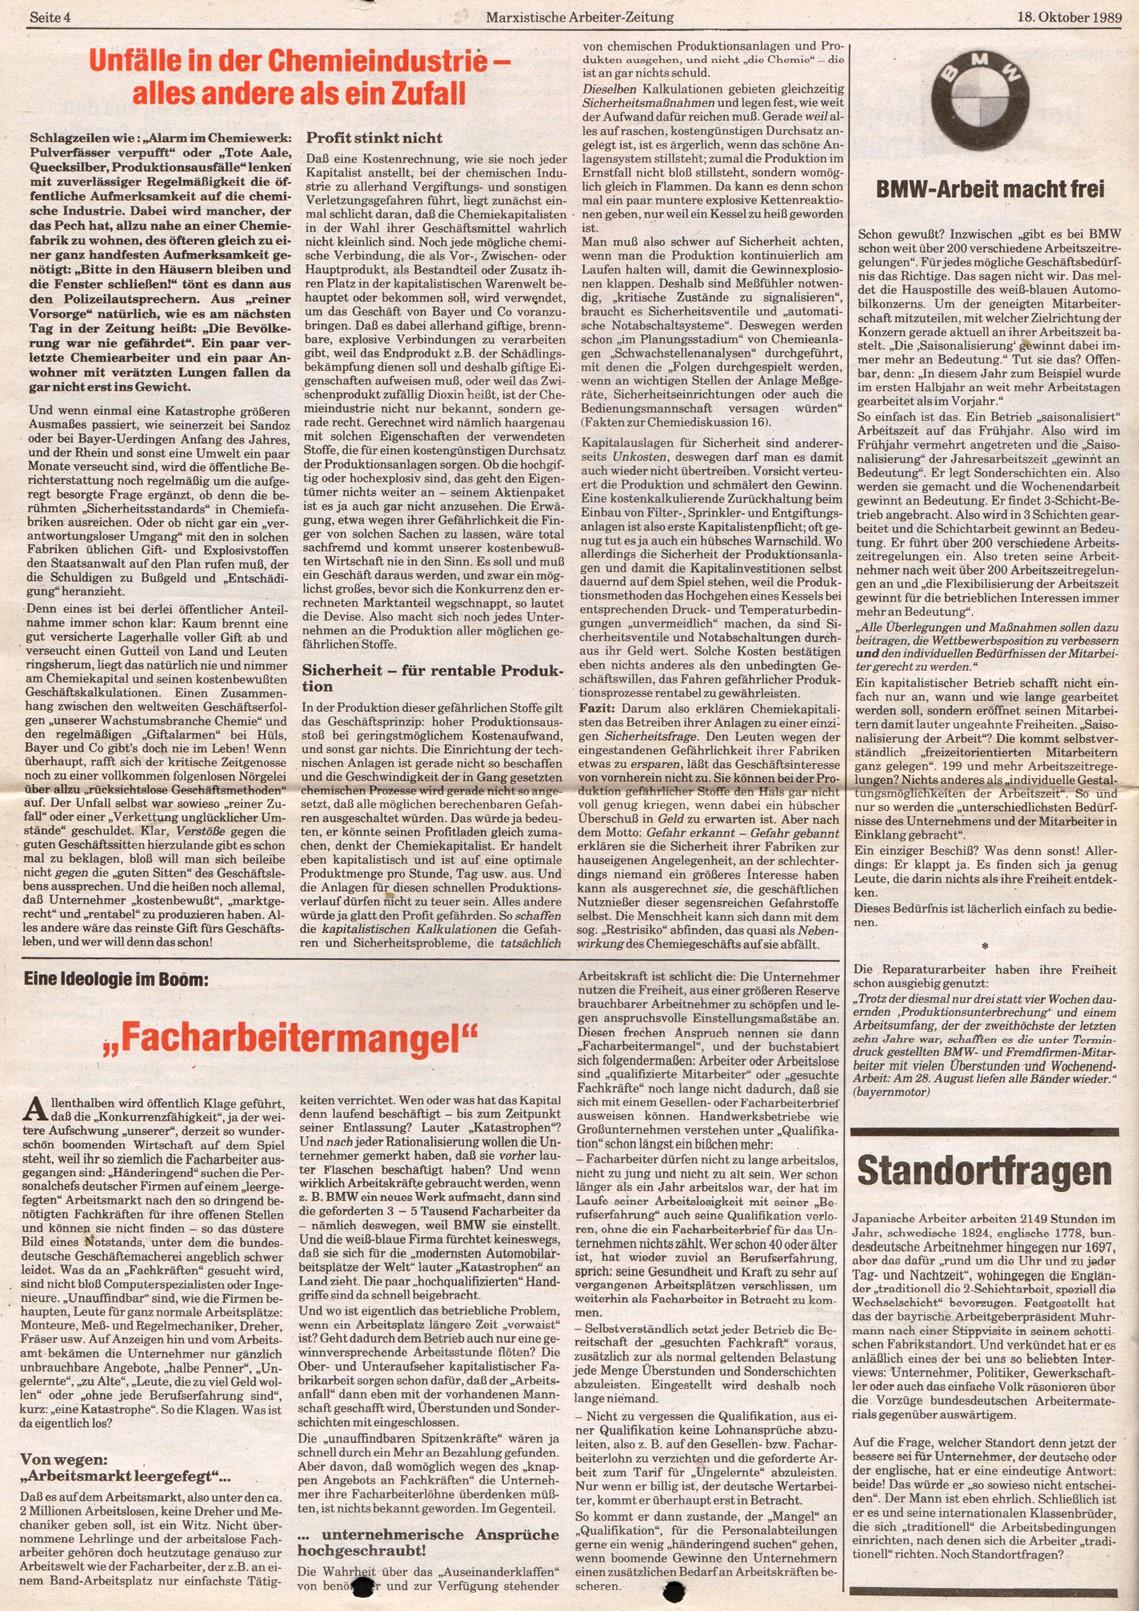 Muenchen_MG_MAZ_19891018_04